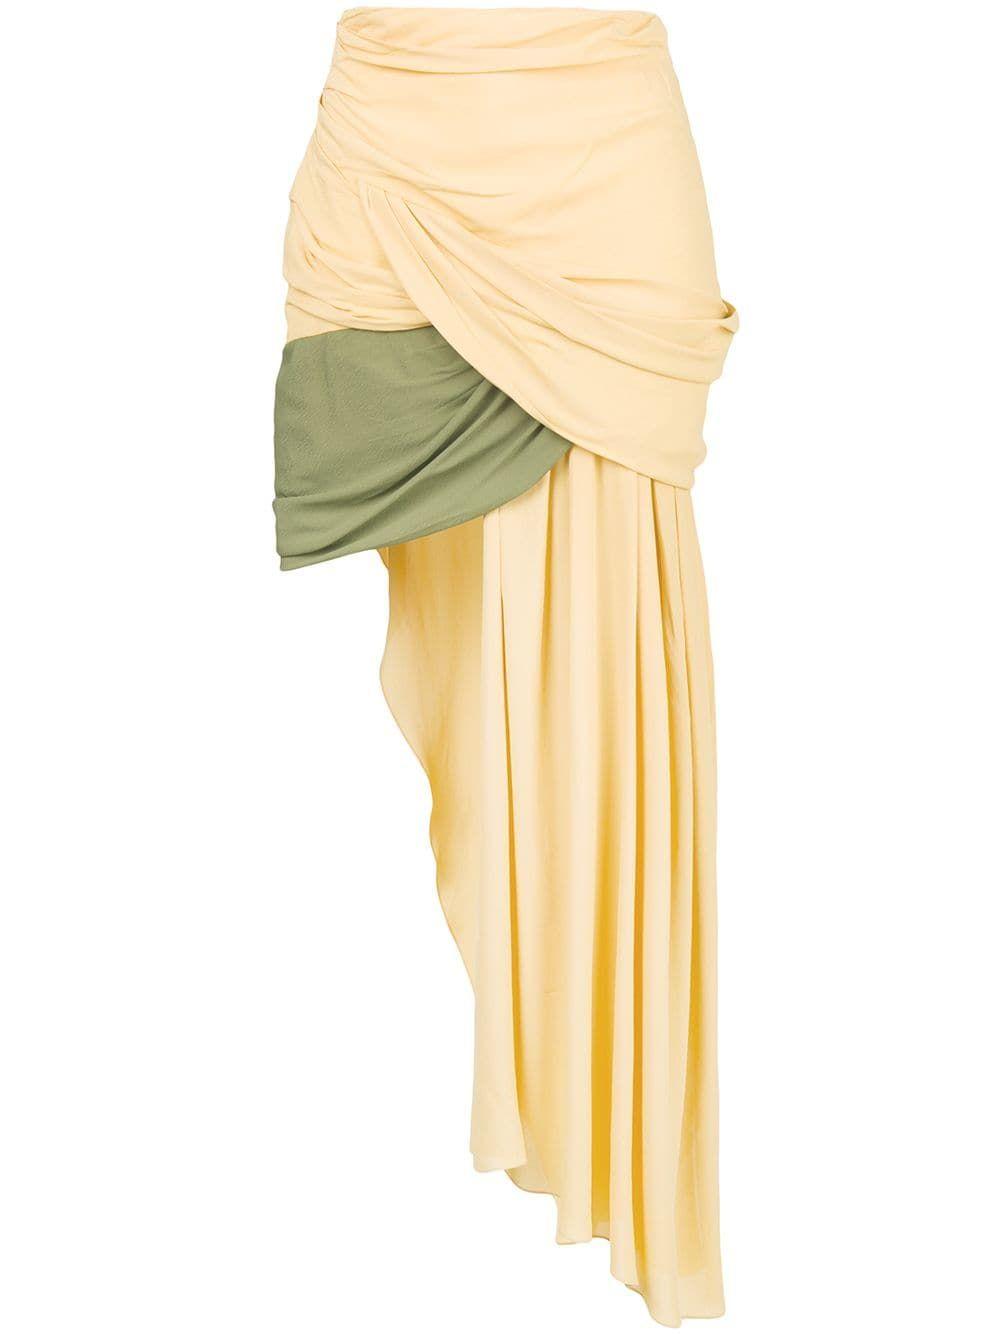 15b0cd220 Jacquemus draped asymmetric skirt | Skirts in 2019 | Skirts ...